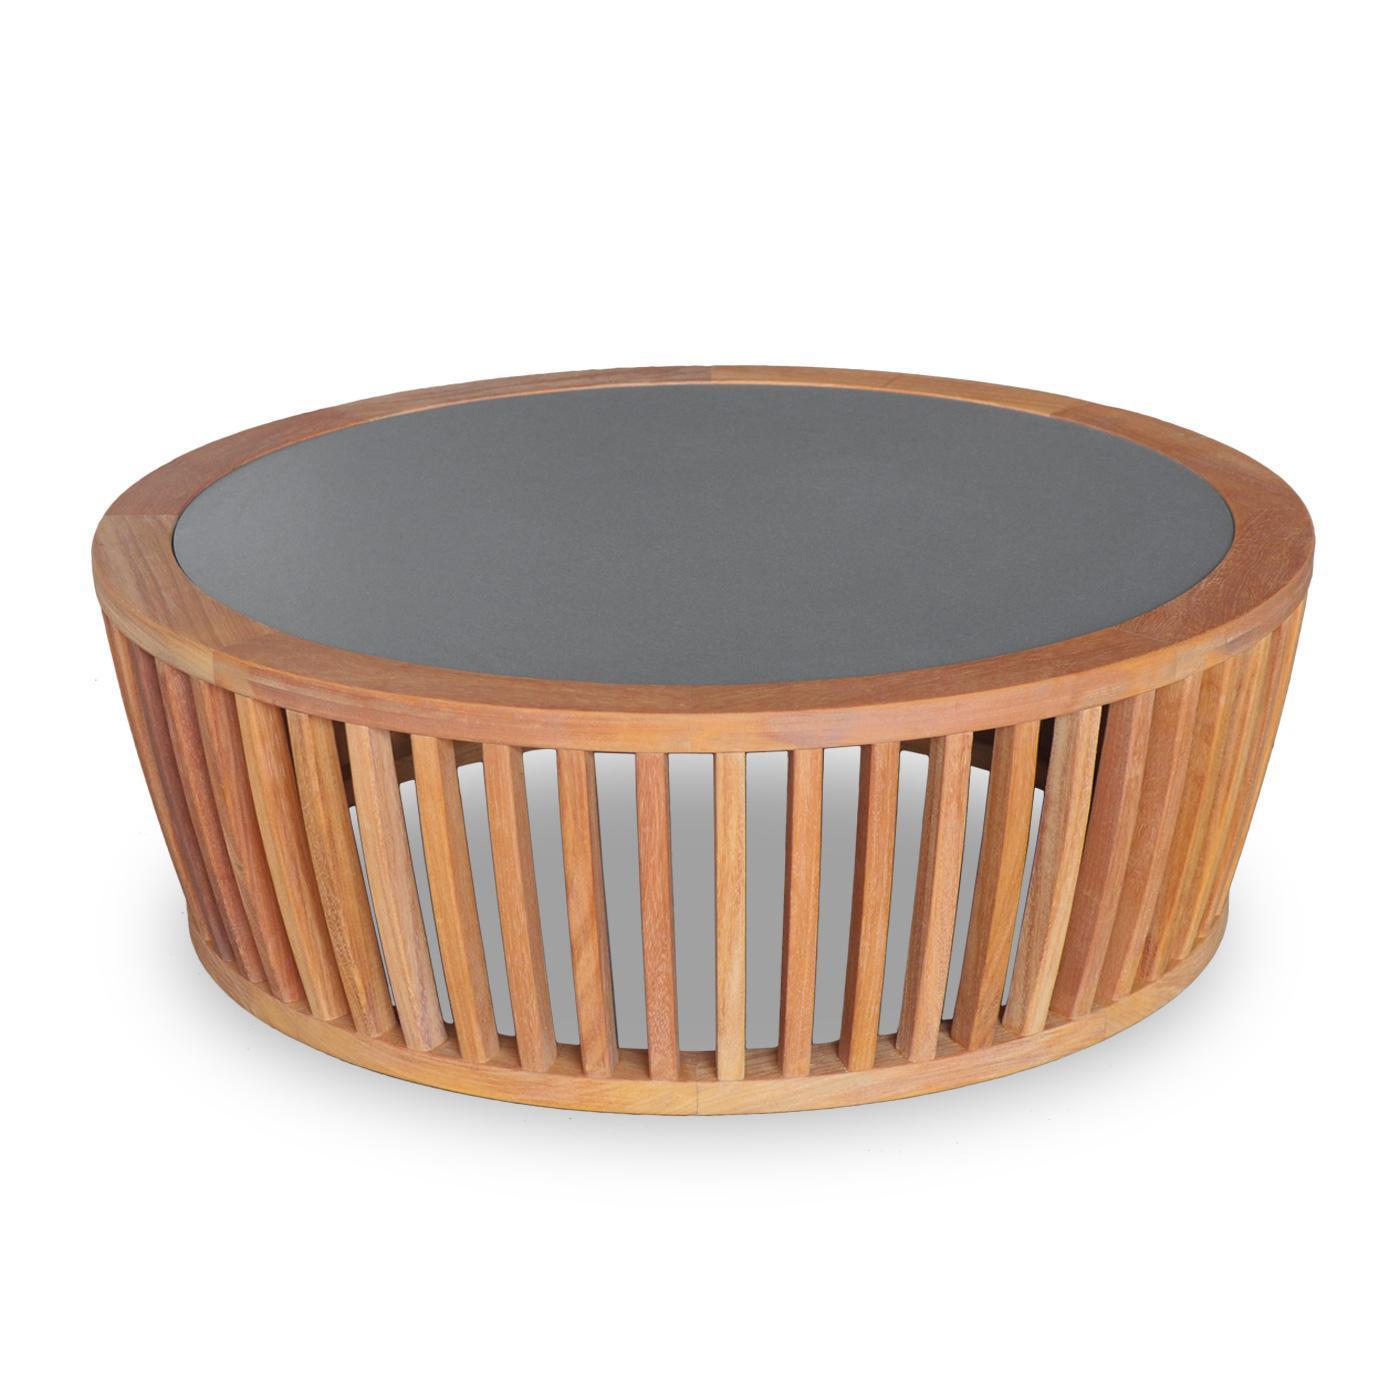 serengeti-coffee-table-round-greyy